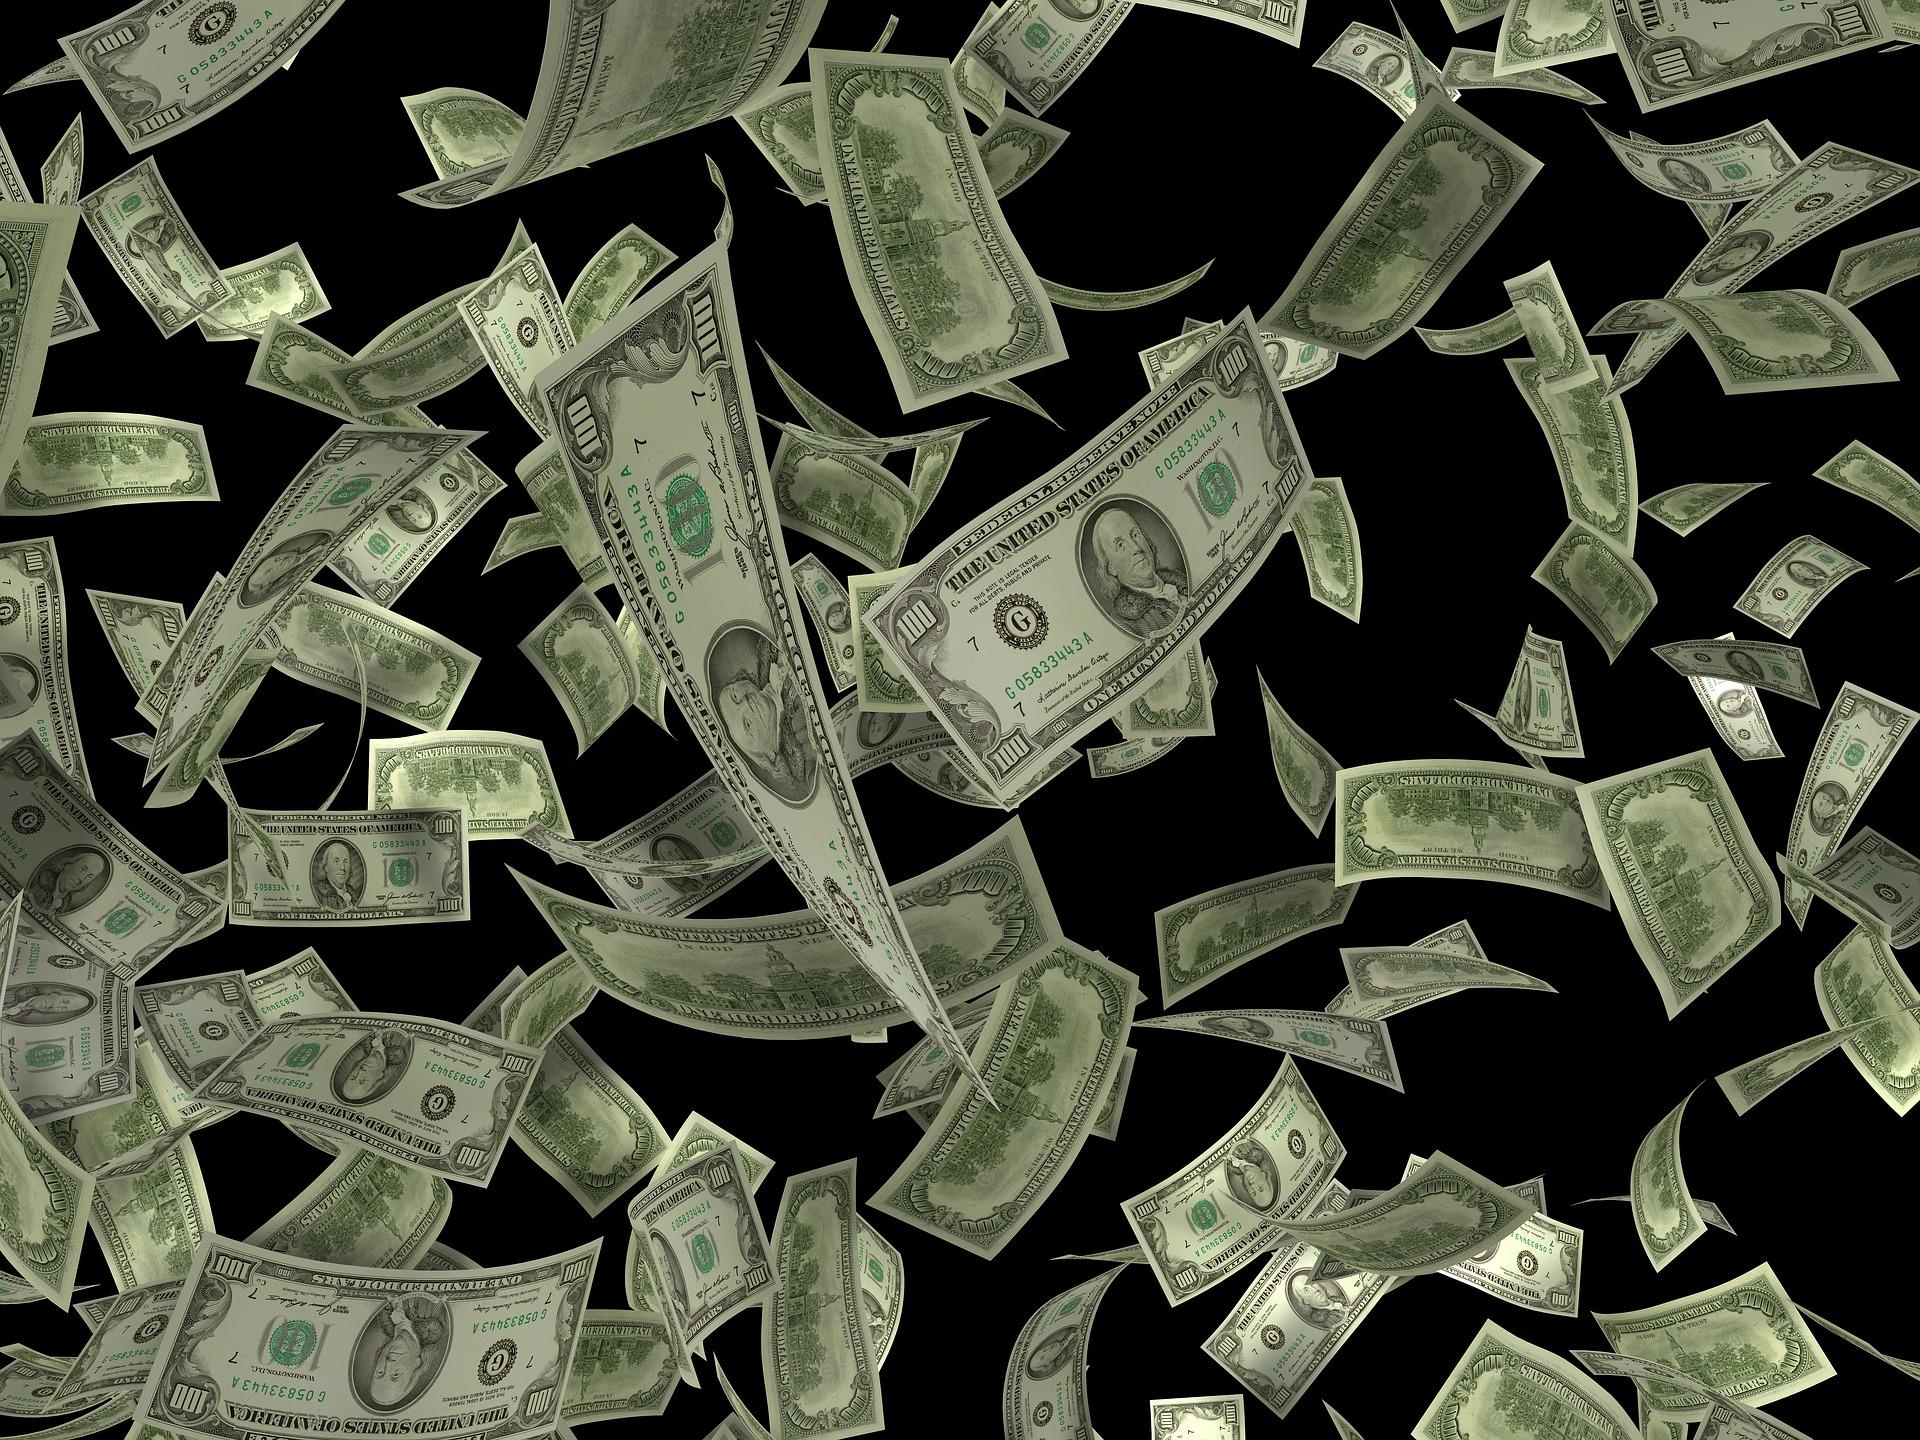 Digital Mortgage Servicer Brace Nabs $15.7M in Funding